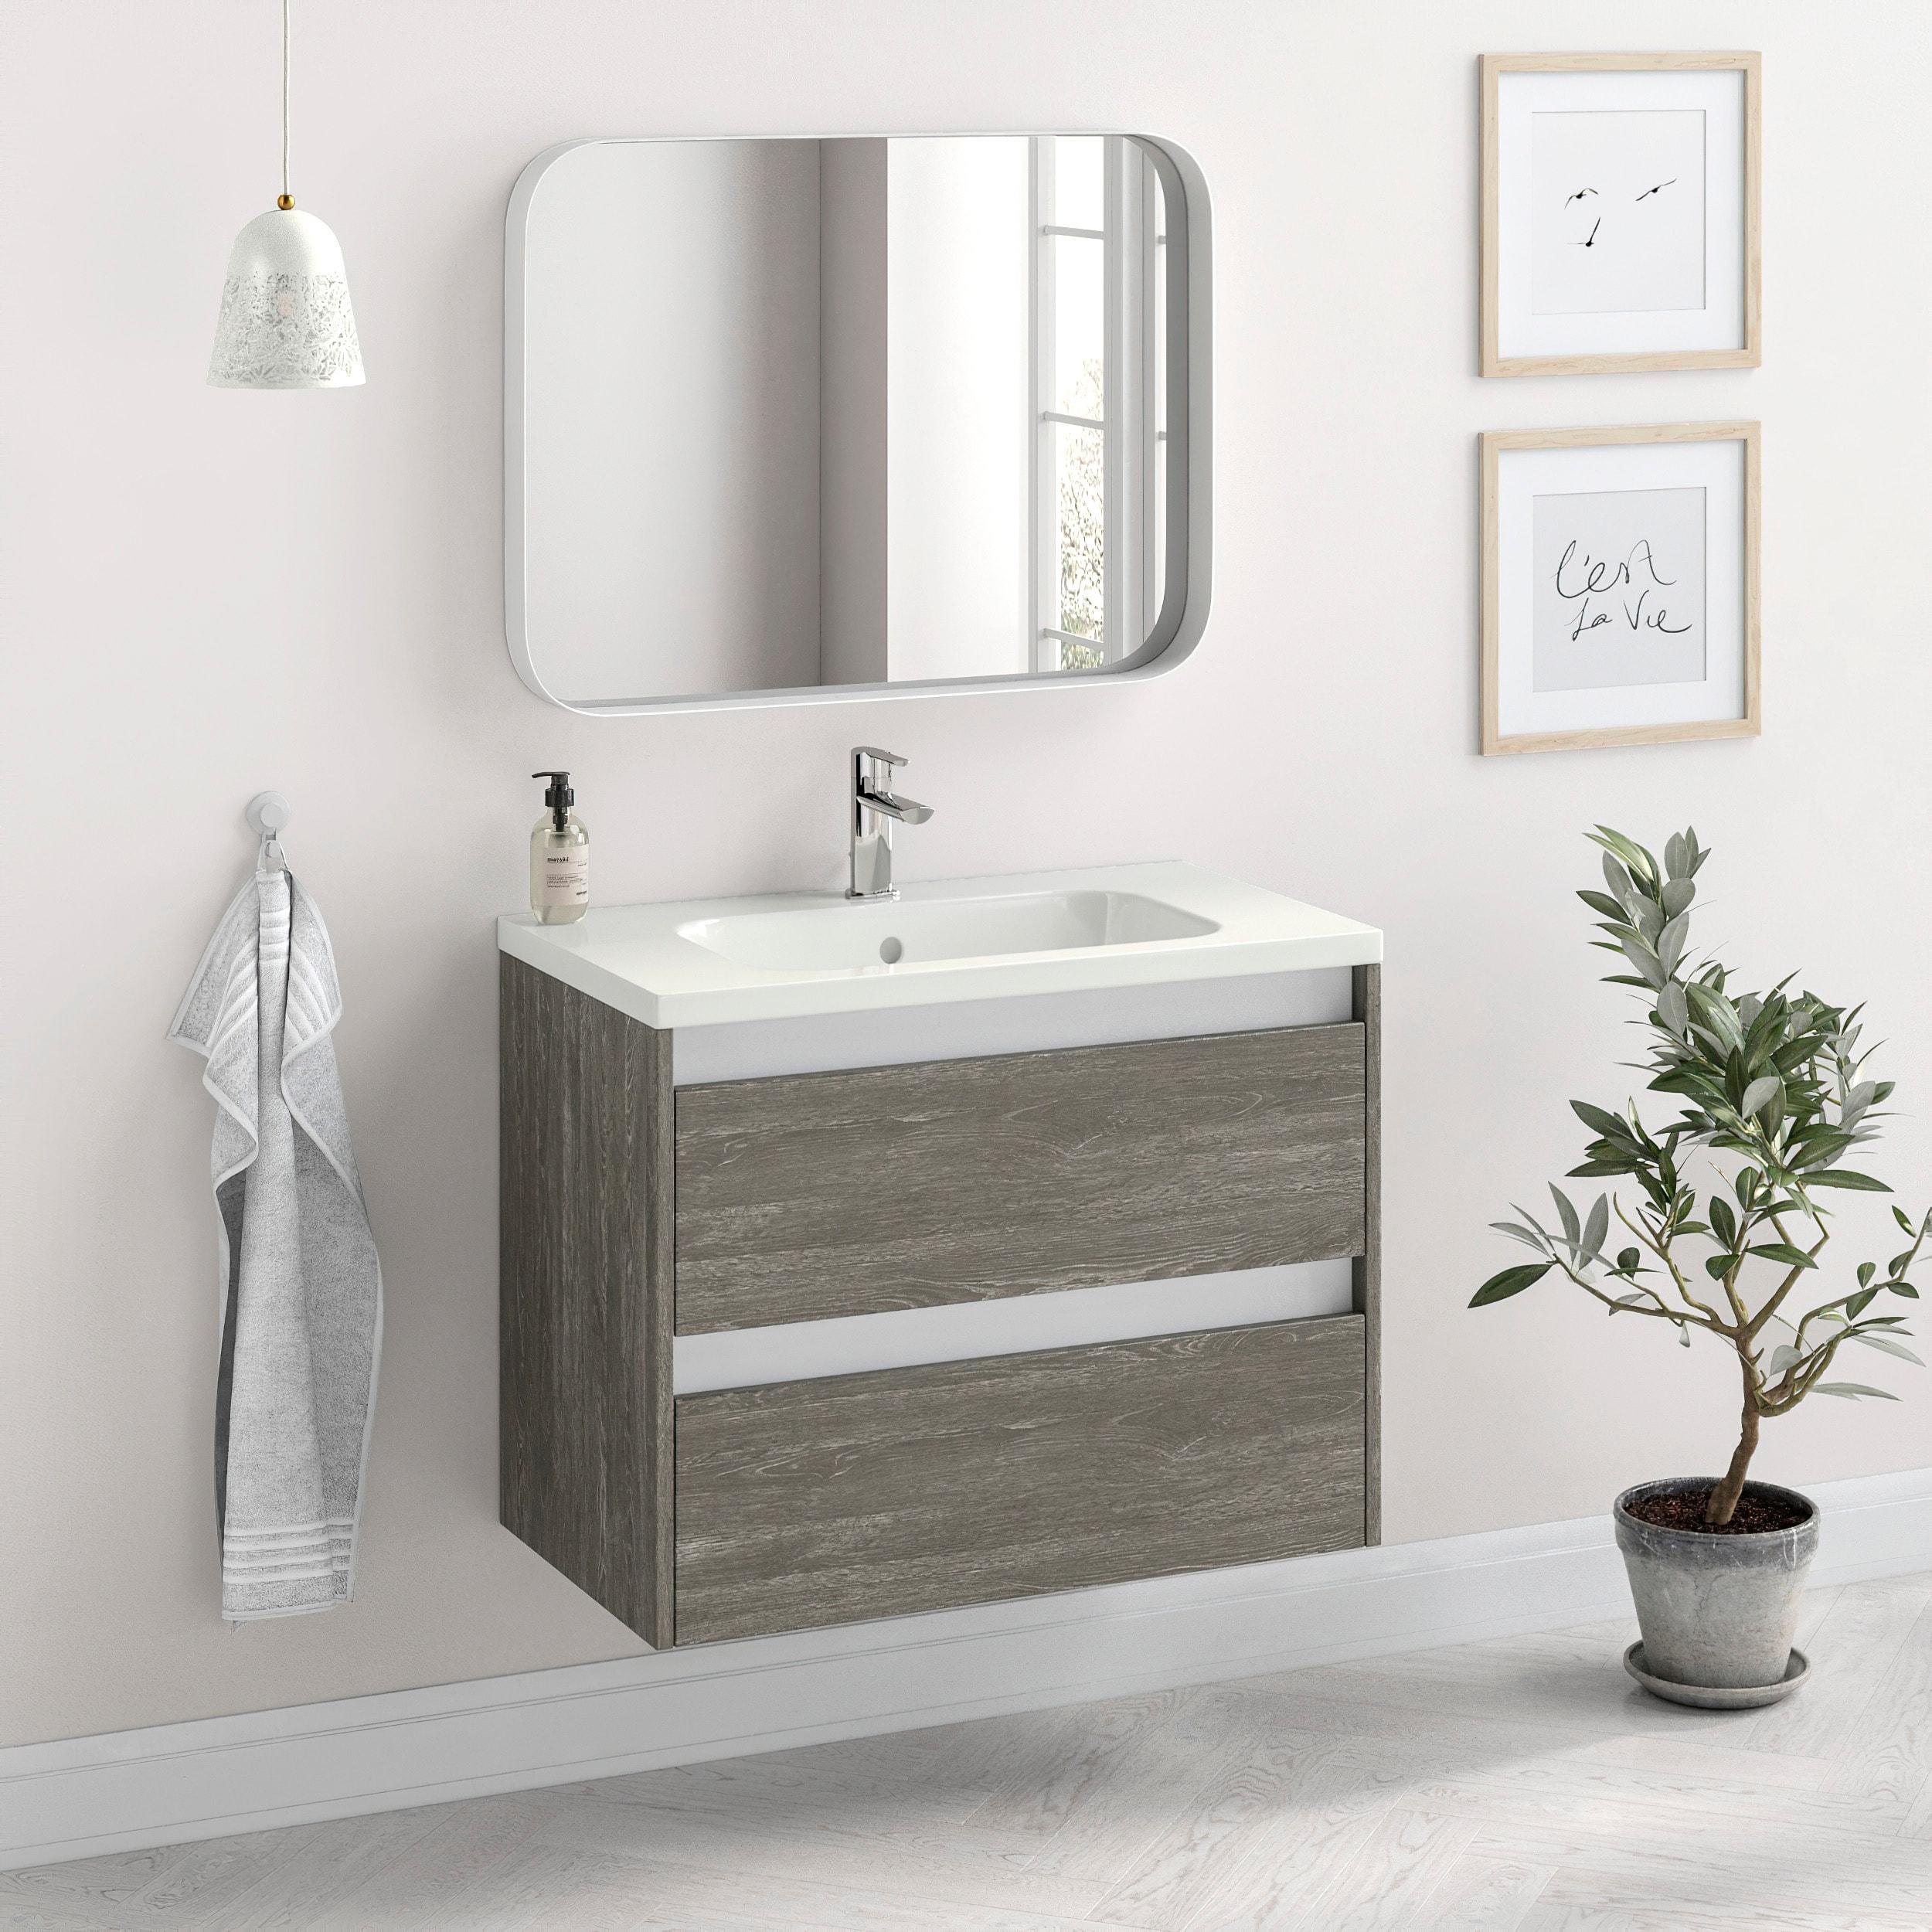 Randalco 32 Modern Bathroom Vanity Cabinet Docce Charred Oak Wood 32 X 24 X 18 Inch Vanity Cabinet Ceramic Top Sink Overstock 32159702